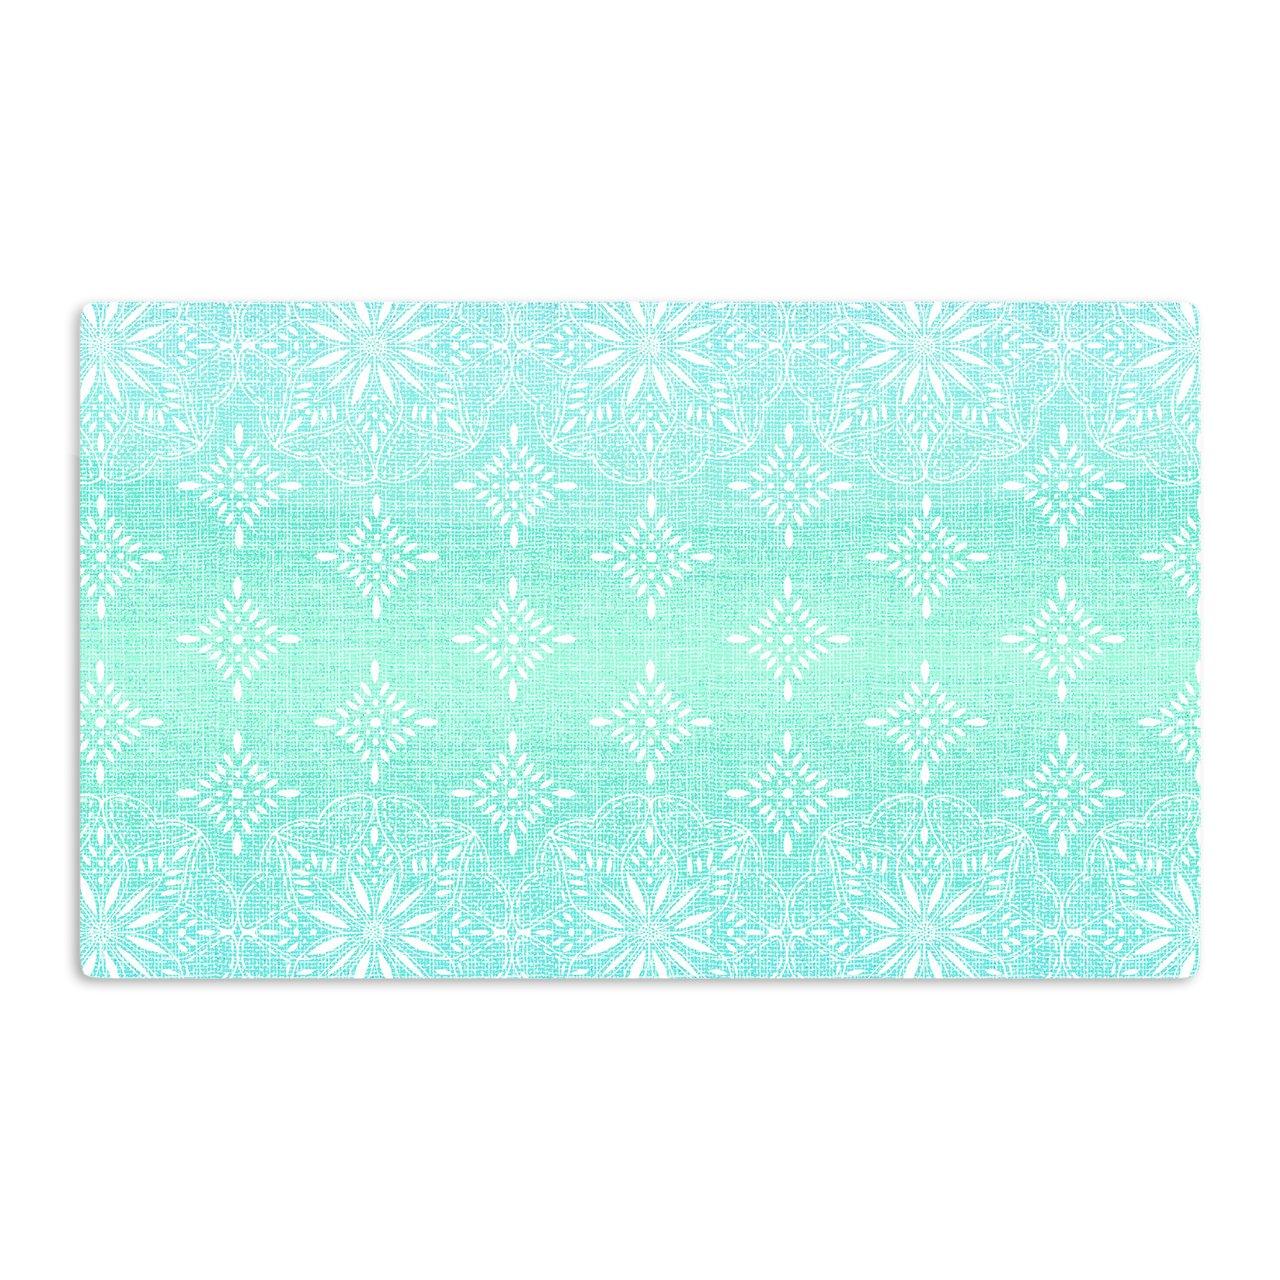 Multicolor KESS InHouse Suzie TremelMedallion Aqua Ombre Blue Teal Artistic Aluminum Magnet 2 by 3